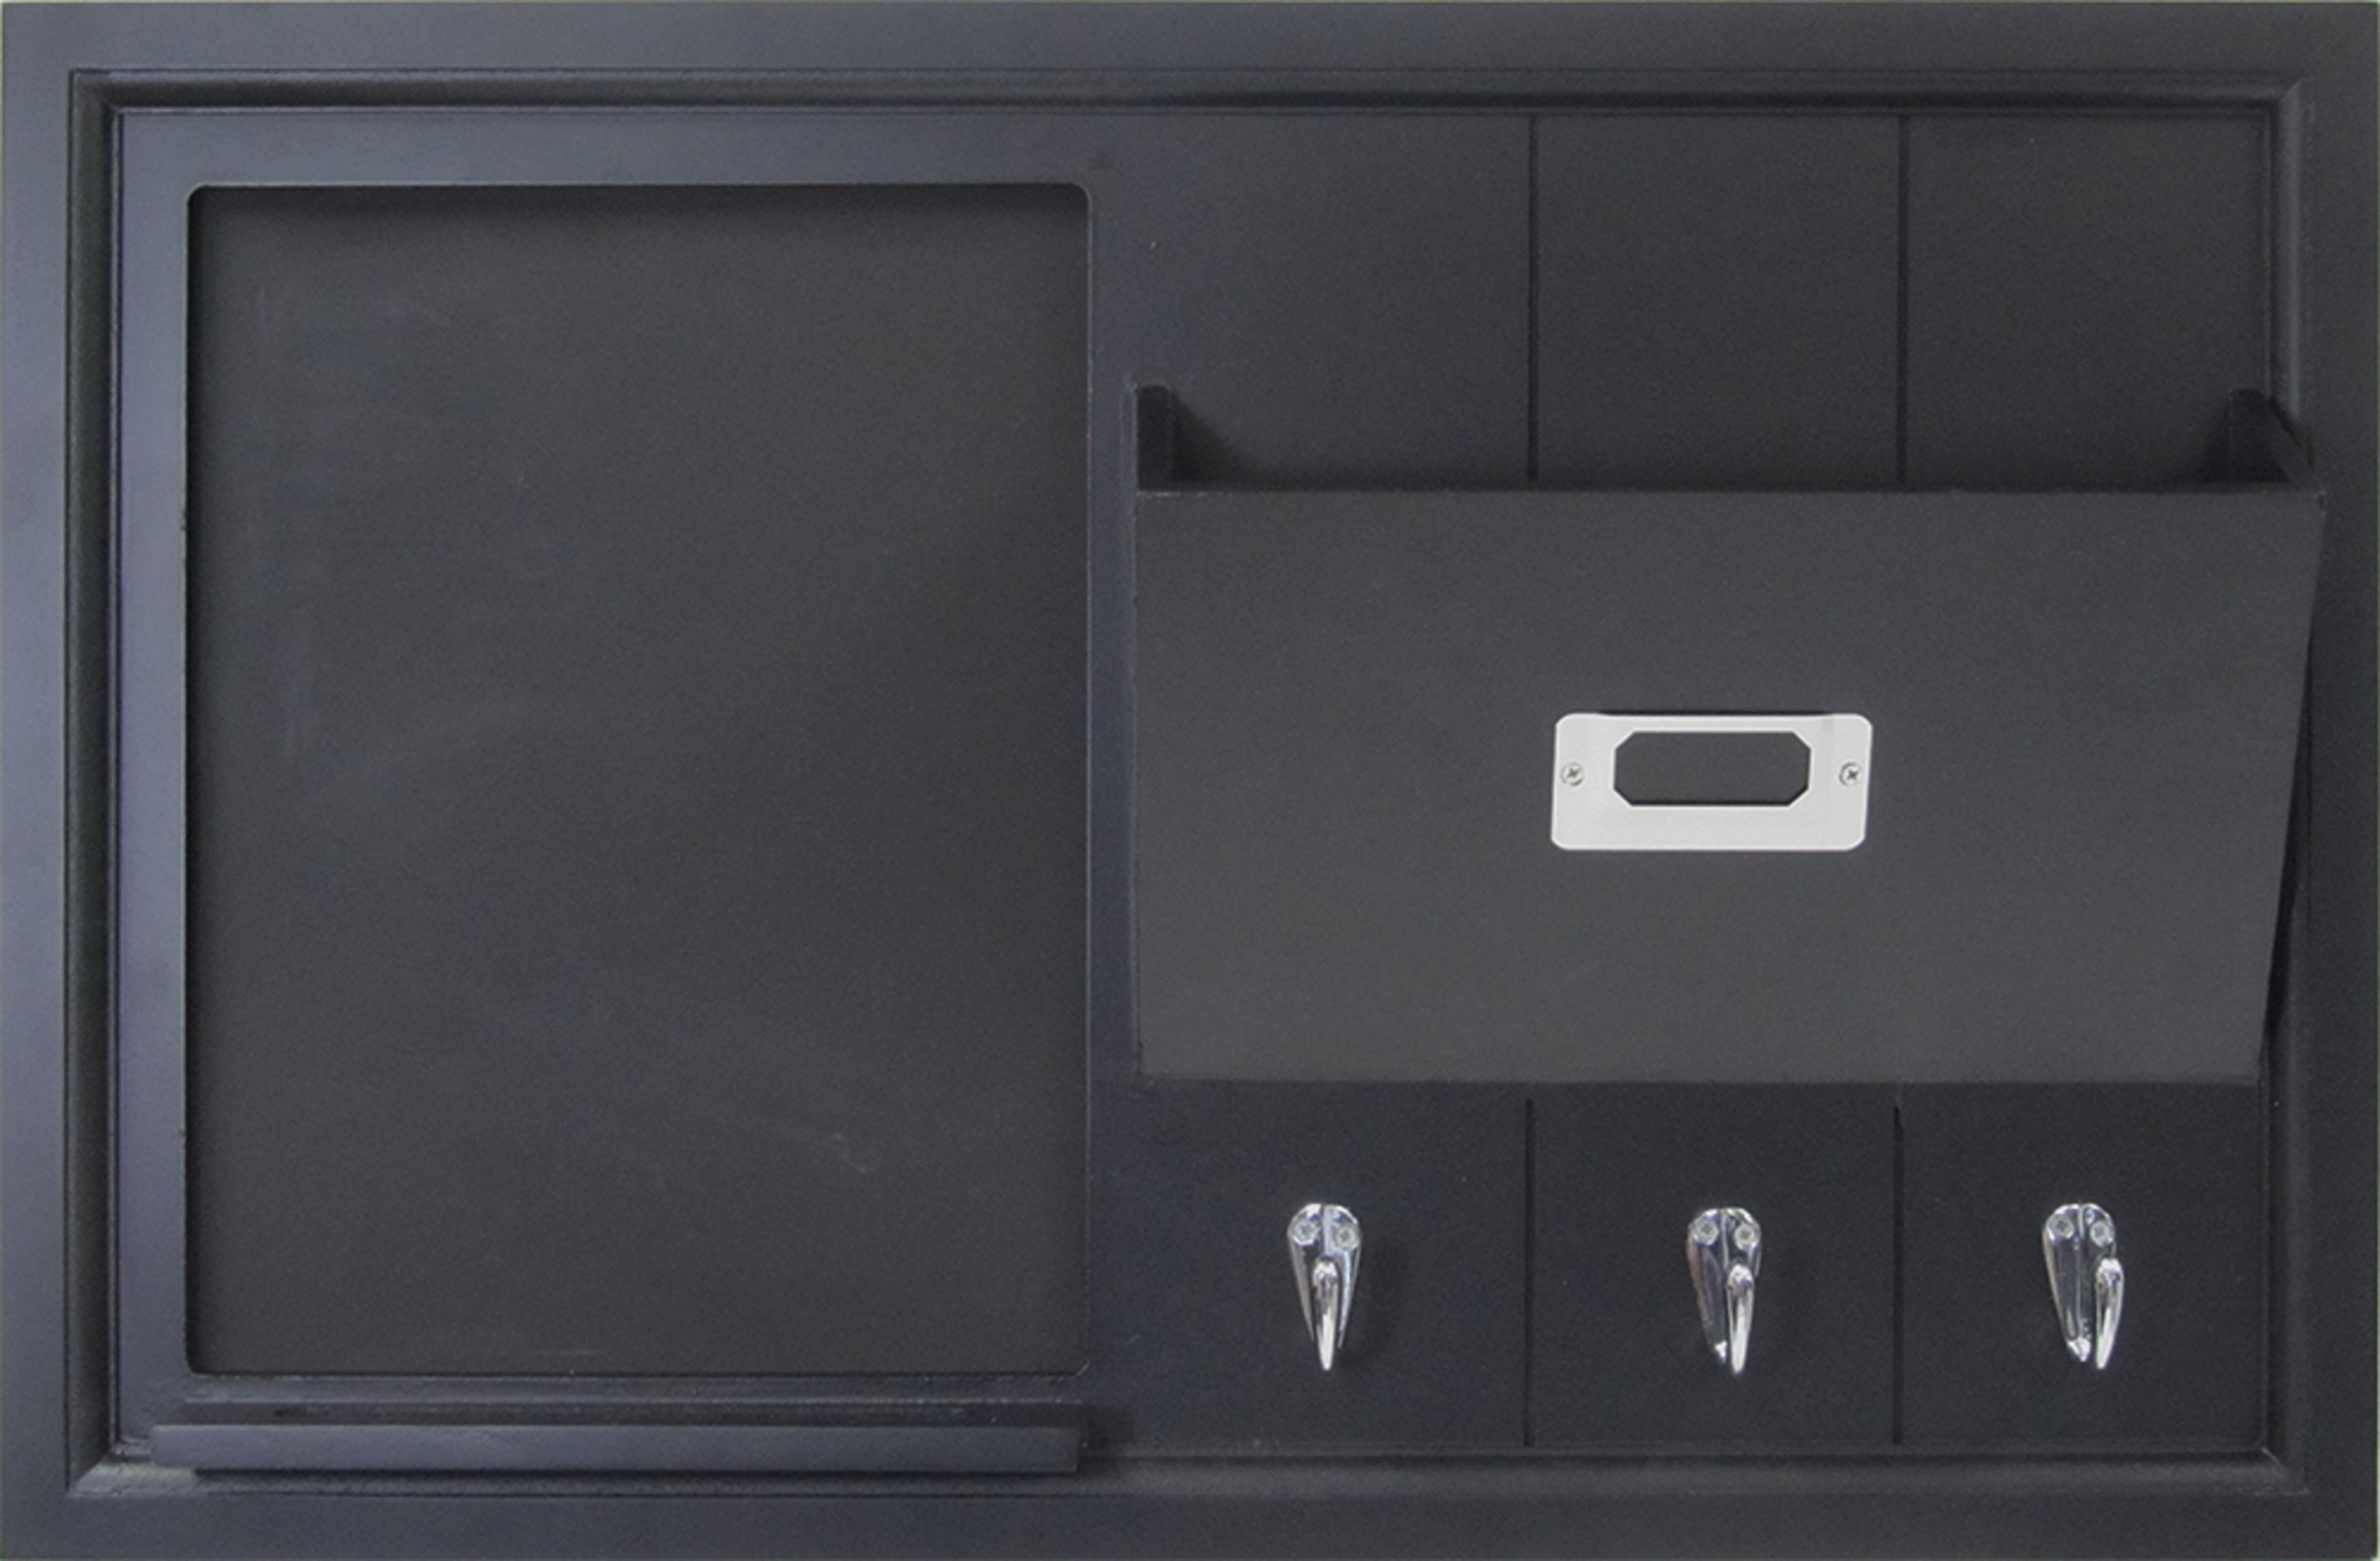 DesignOvation Dagny Decorative Home Organizer 21x14 with Chalkboard, Mail Holder, Key Hooks, Black (208438)